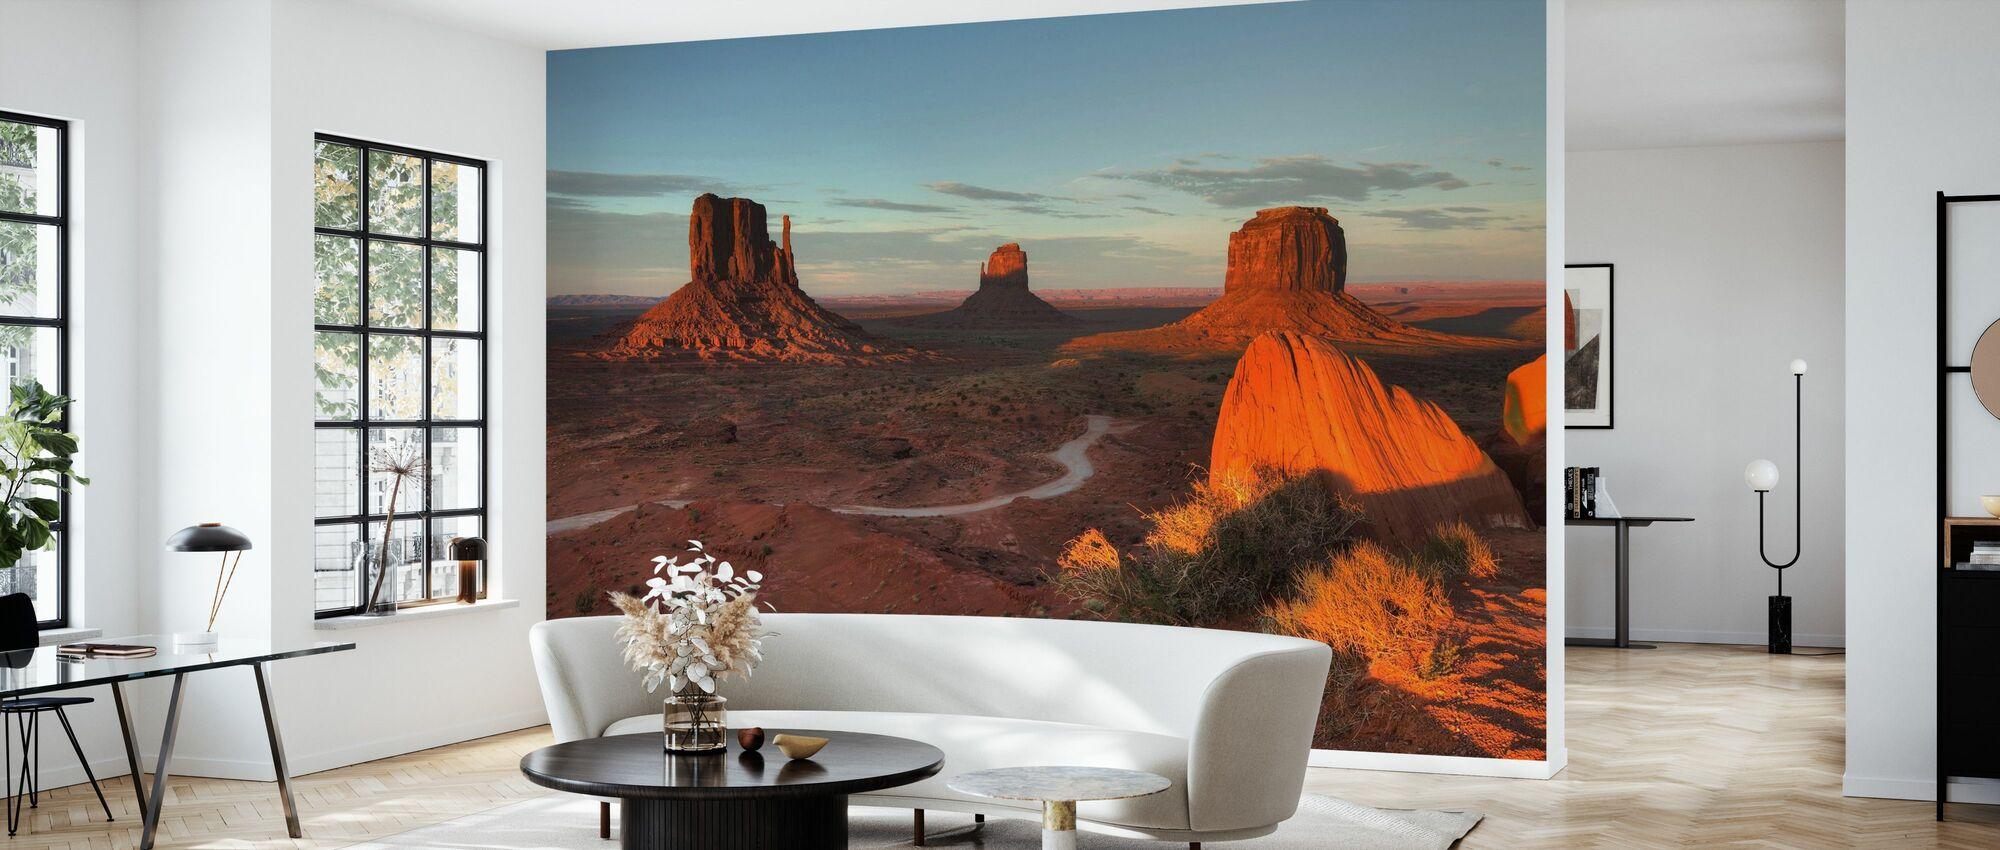 Colorado Plateau - Wallpaper - Living Room